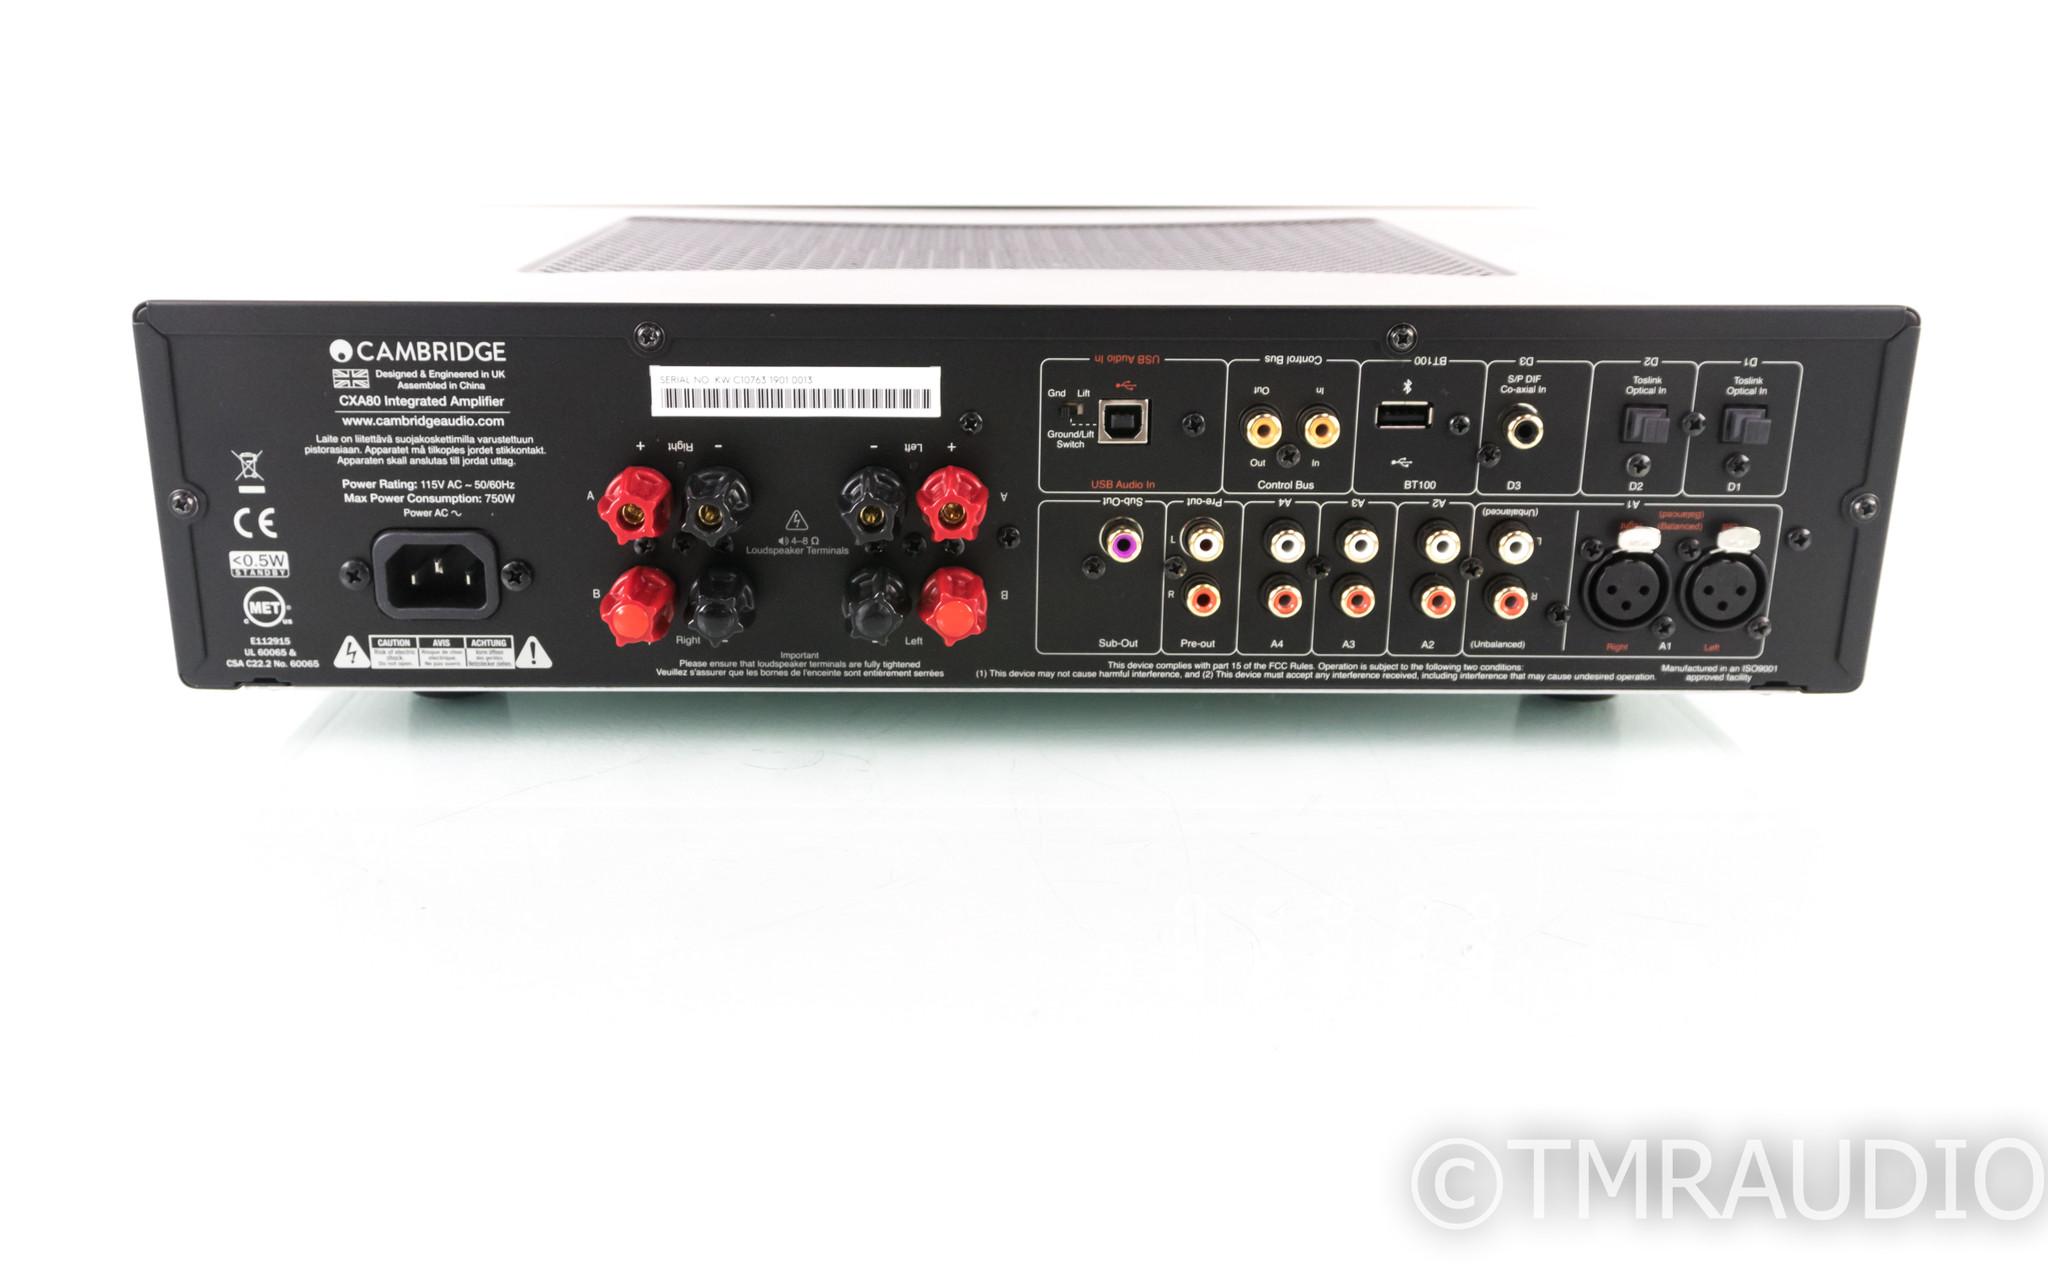 Cambridge CXA80 Stereo Integrated Amplifier